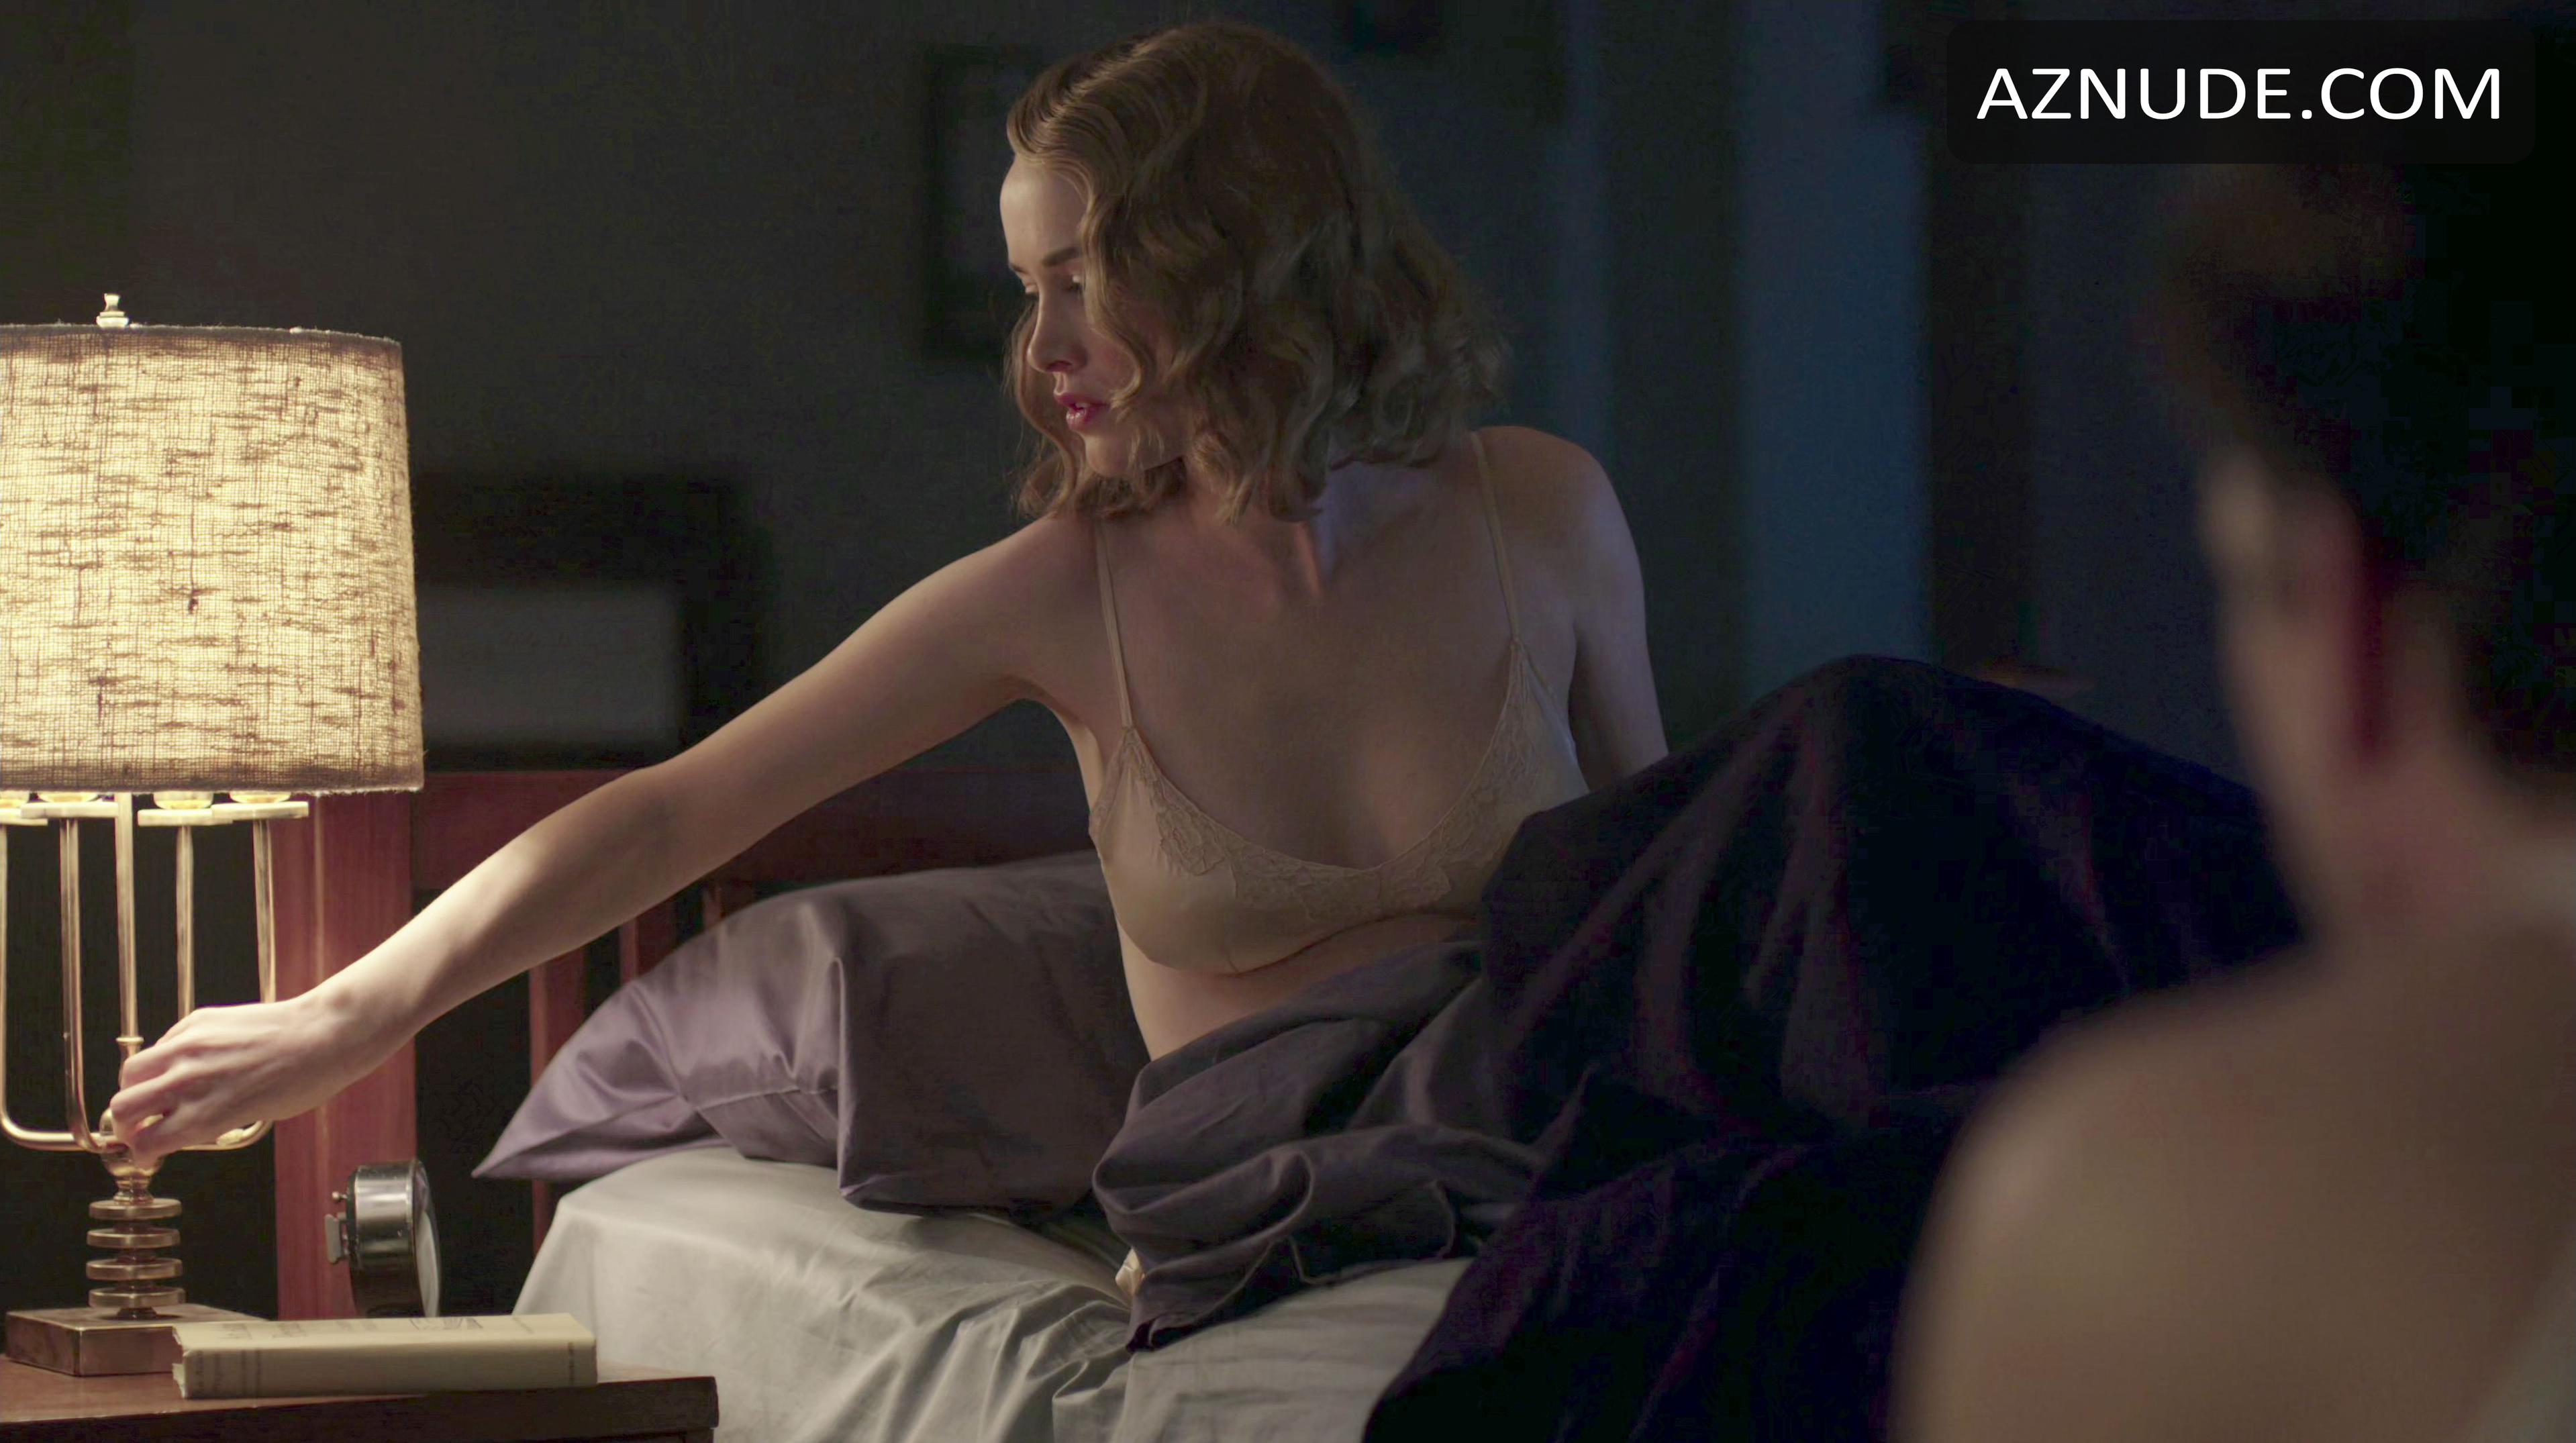 dominique mcelligott ever nude